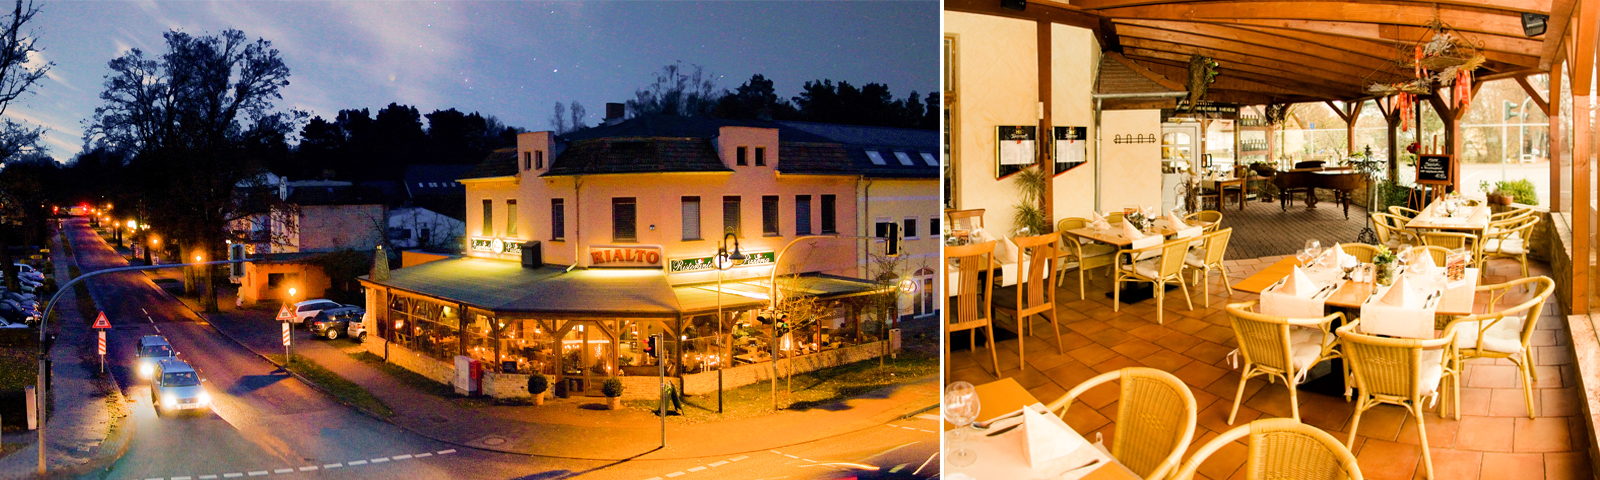 Brauhaus & Restaurant Rialto | Wandlitz